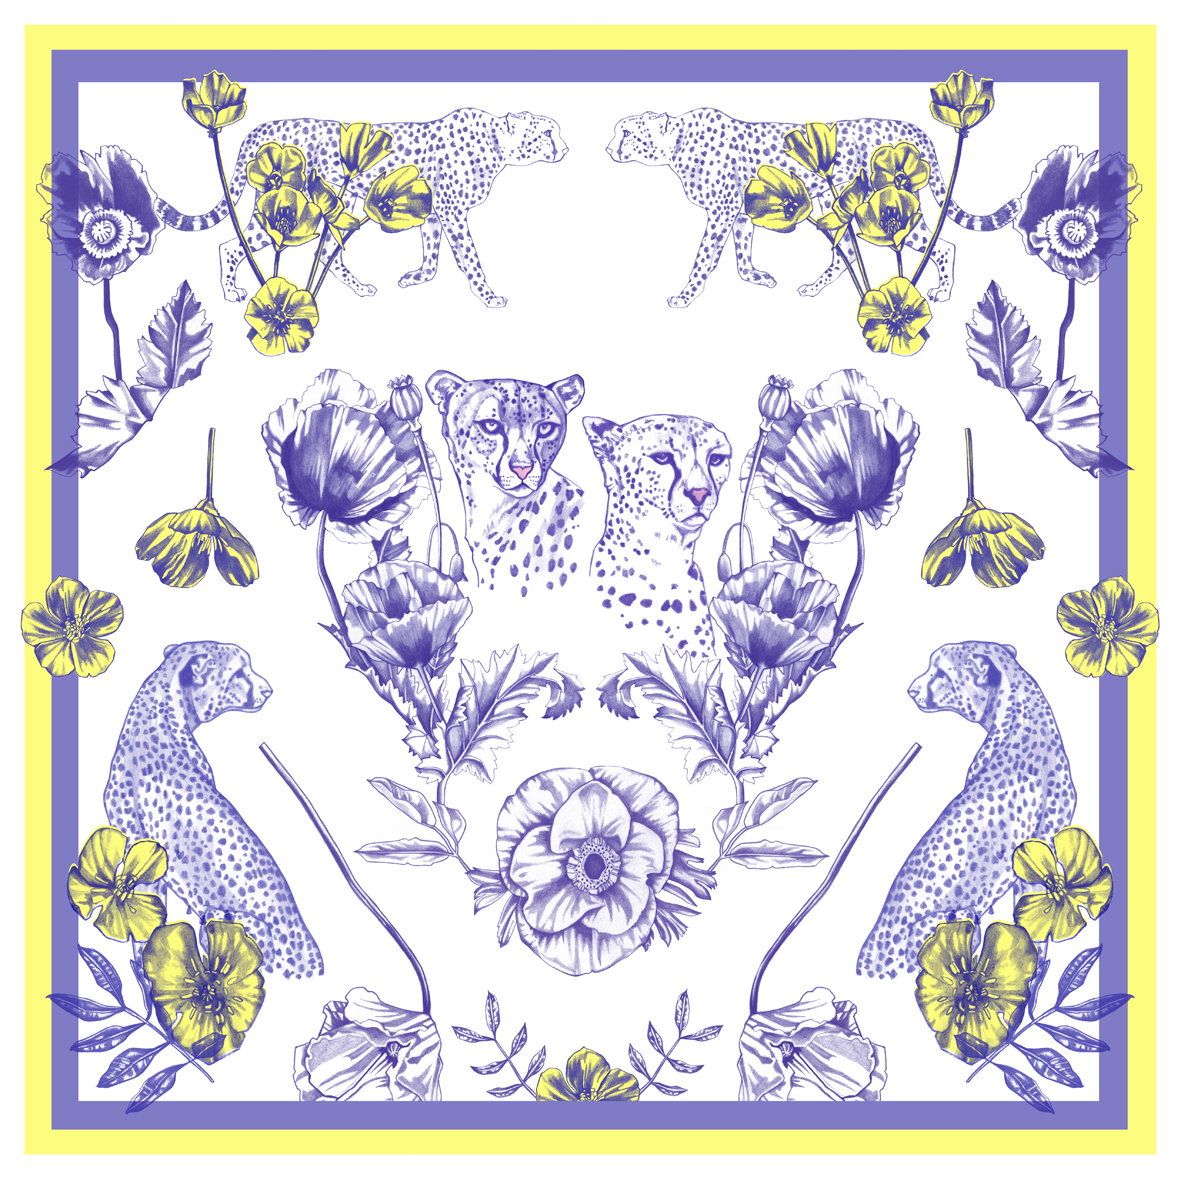 cheetah scarf pattern final2.jpg